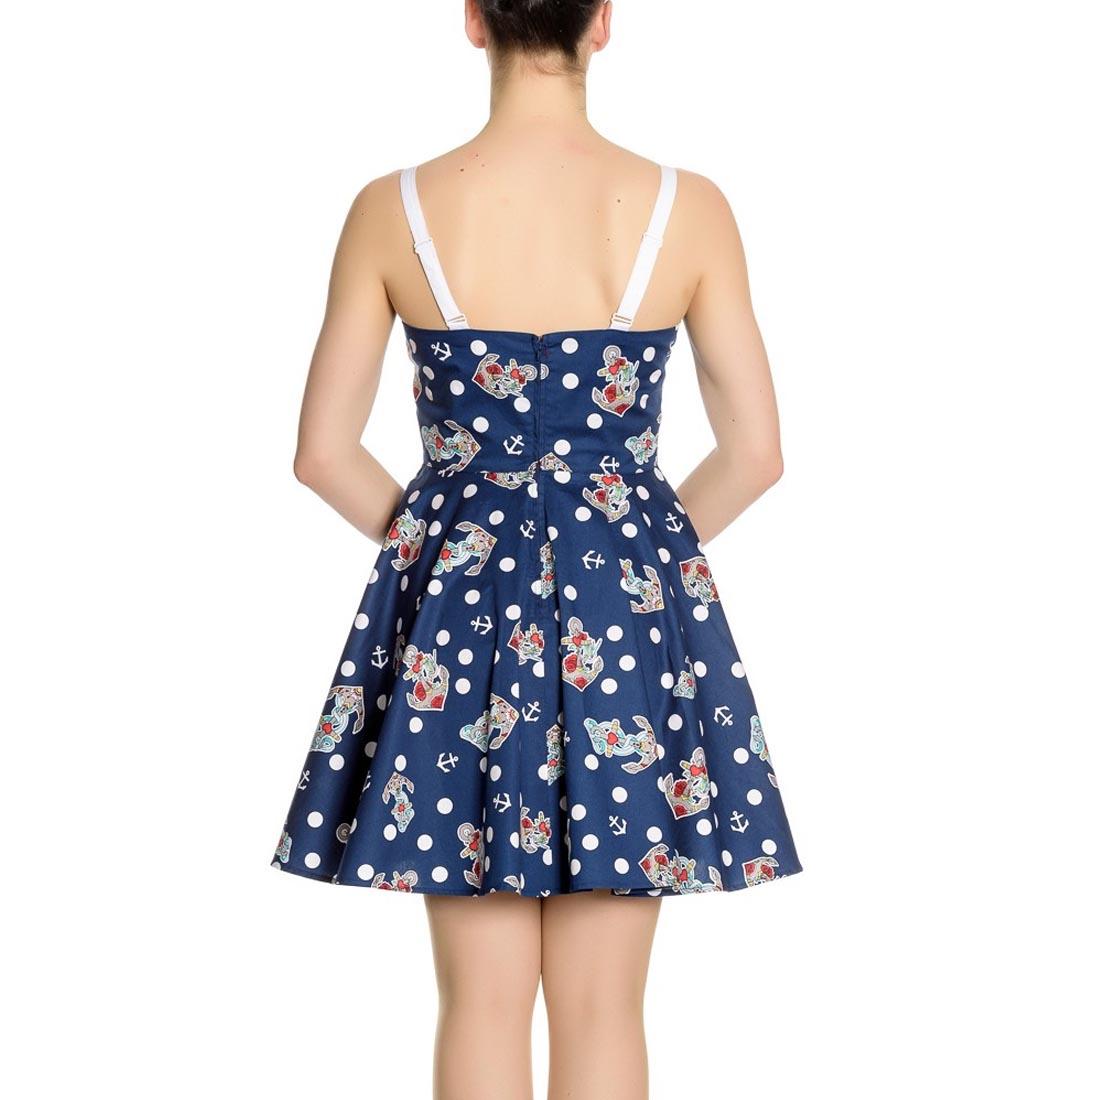 Hell-Bunny-Navy-Blue-50s-Nautical-Mini-Dress-OCEANA-Polka-Dot-All-Sizes thumbnail 33